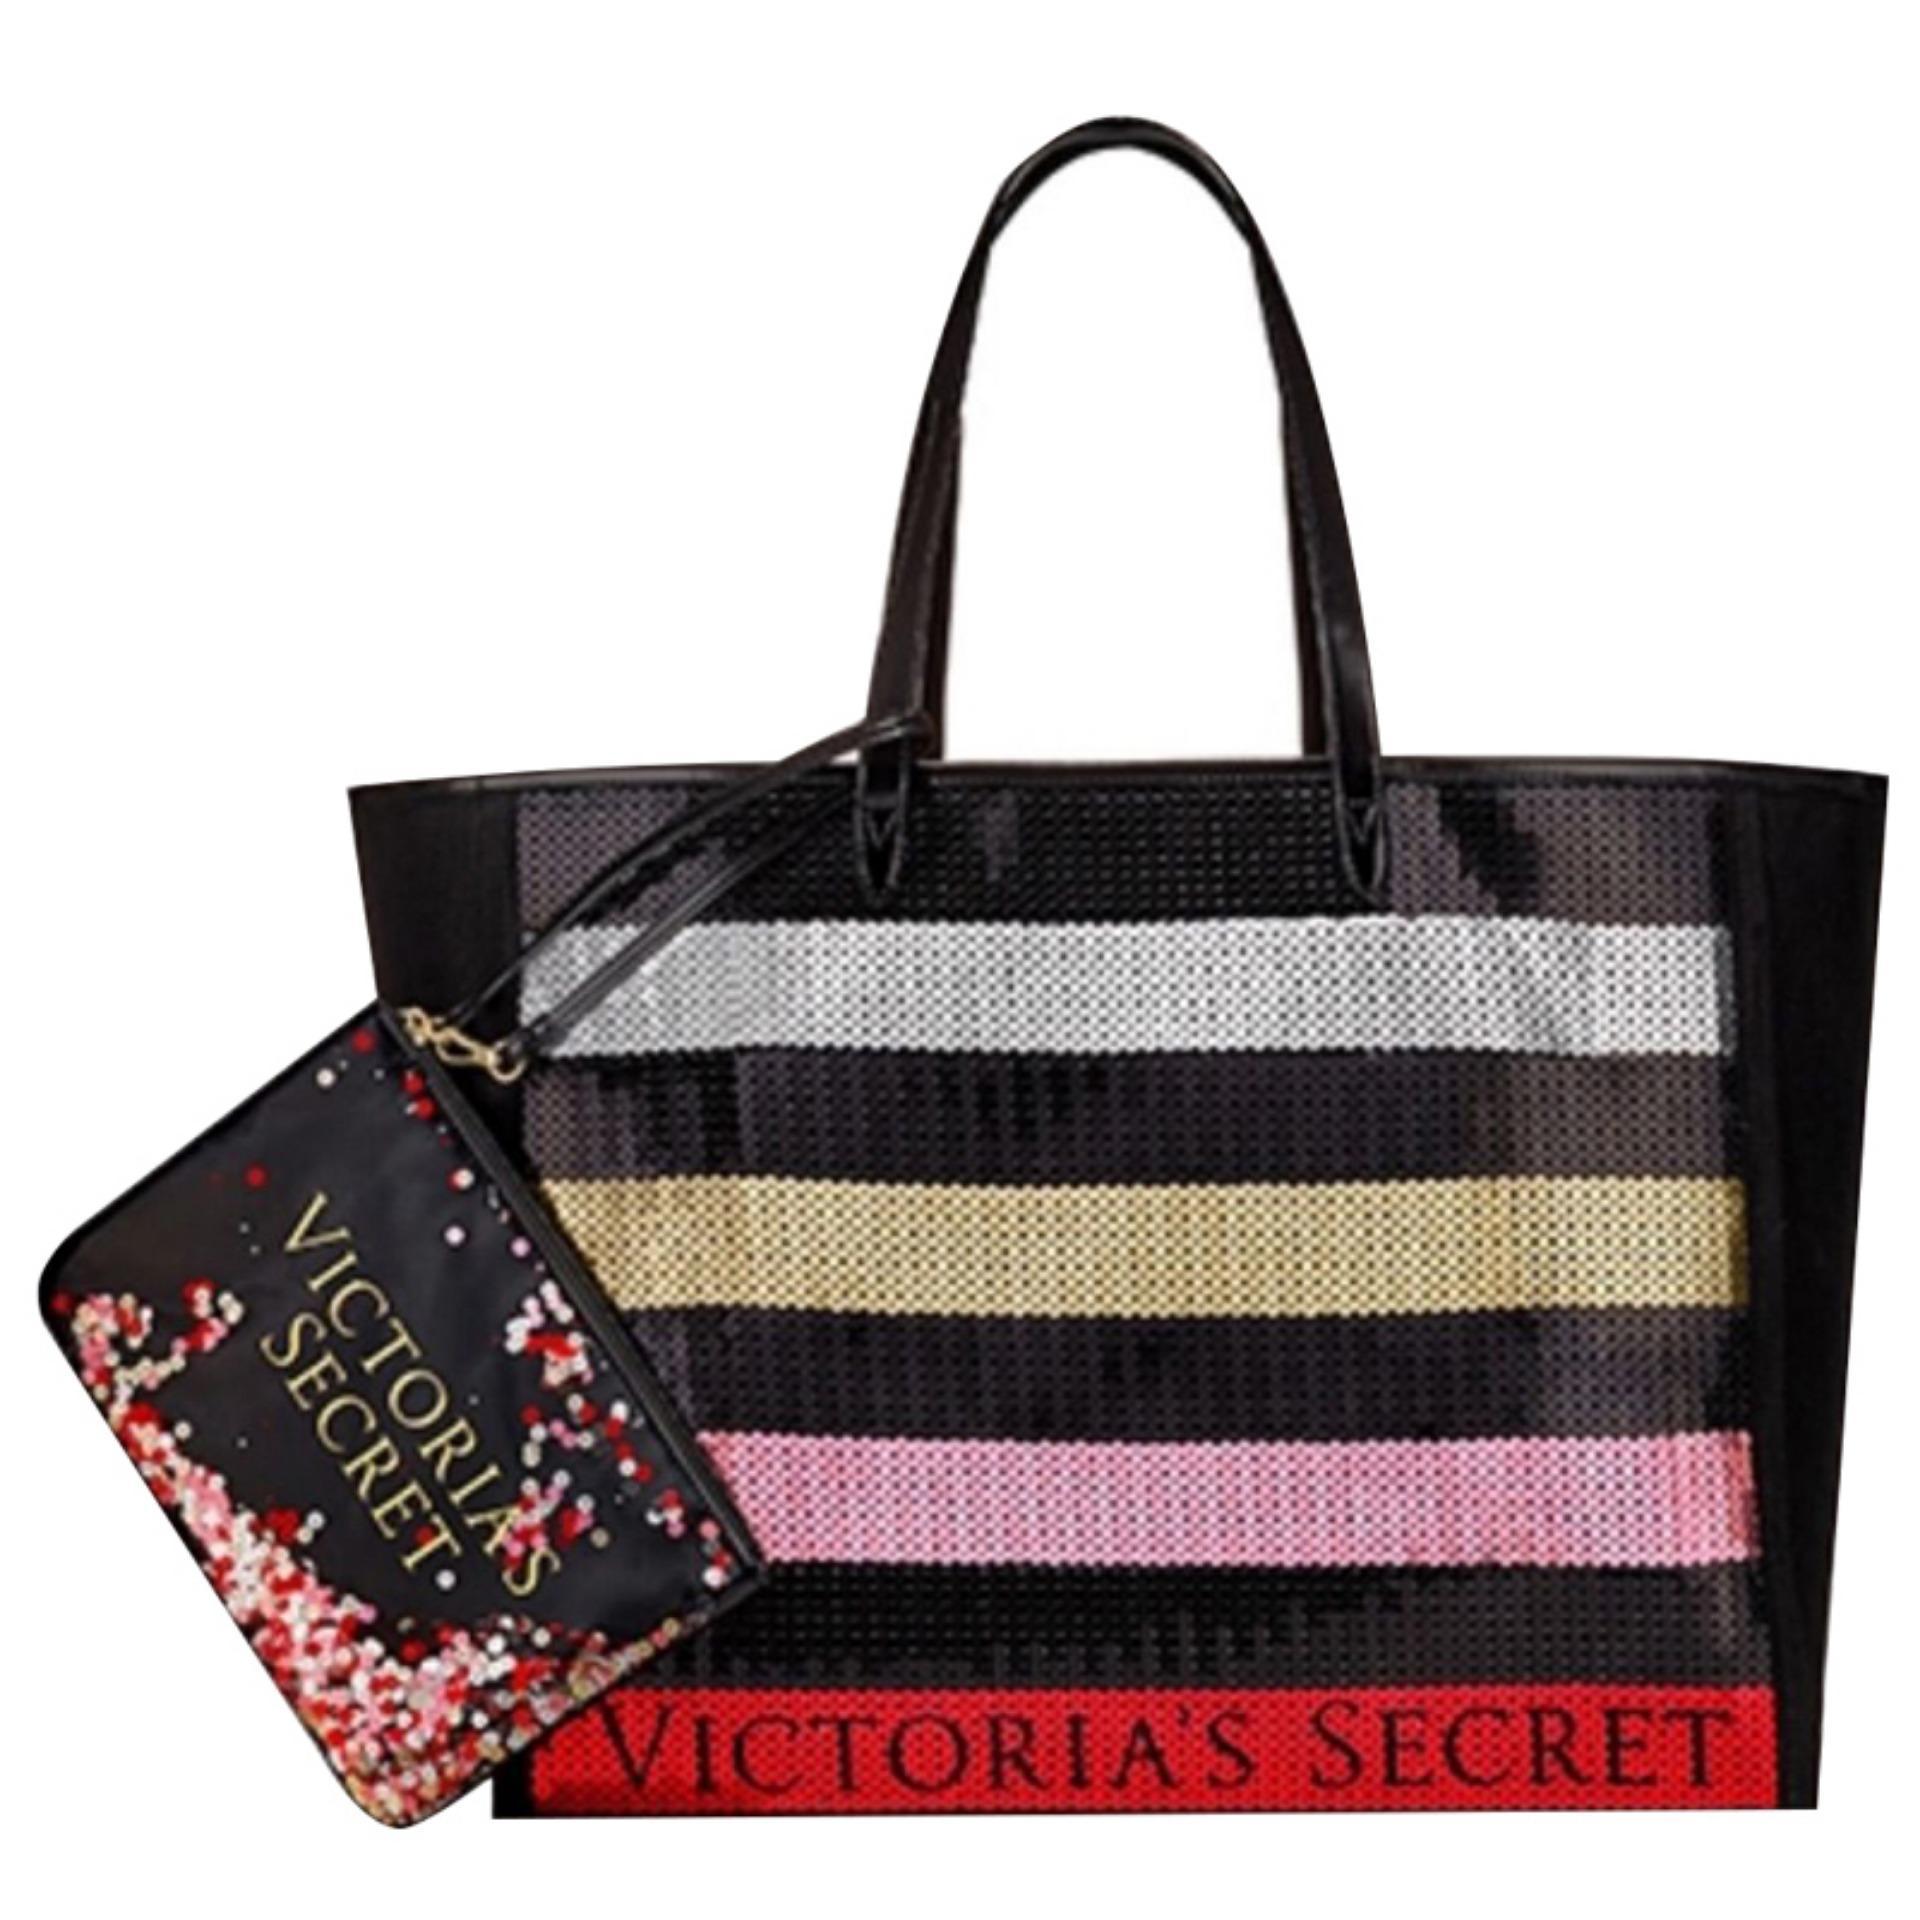 Victoria secret pink mini backpack size fenix toulouse handball jpg  1920x1920 Victorias secret pink tote bag 0aefeacef9883